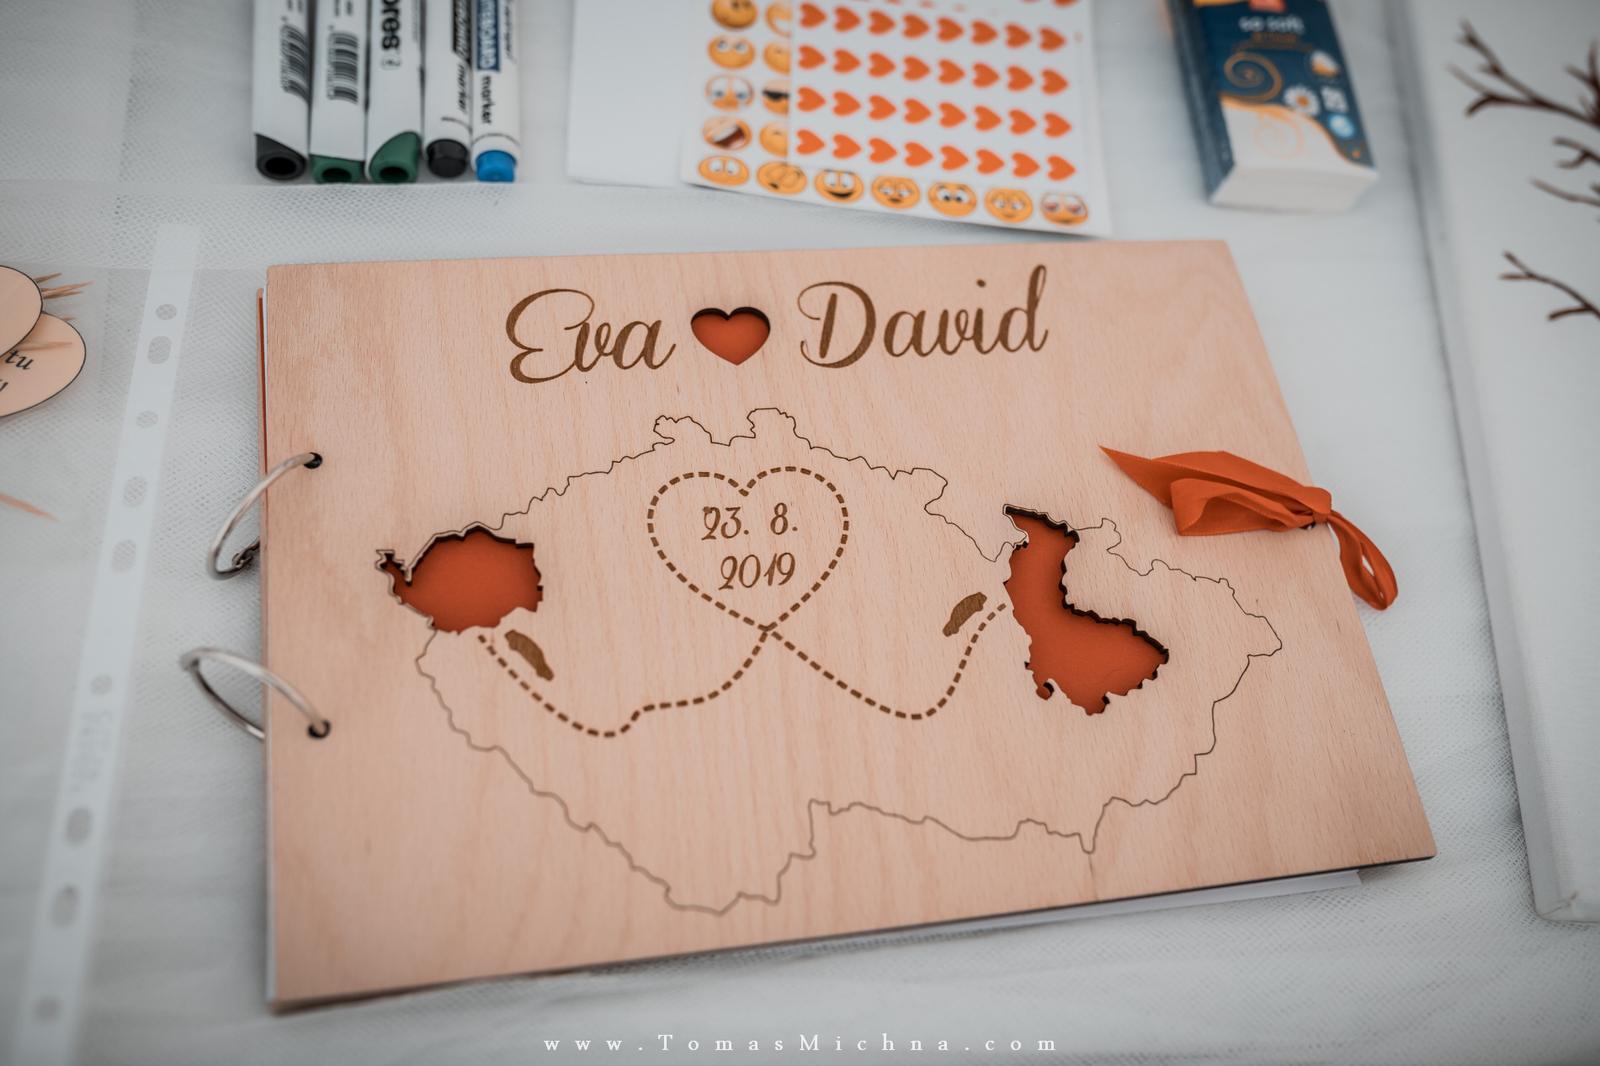 ♥ Eva & David ♥ - Obrázok č. 3